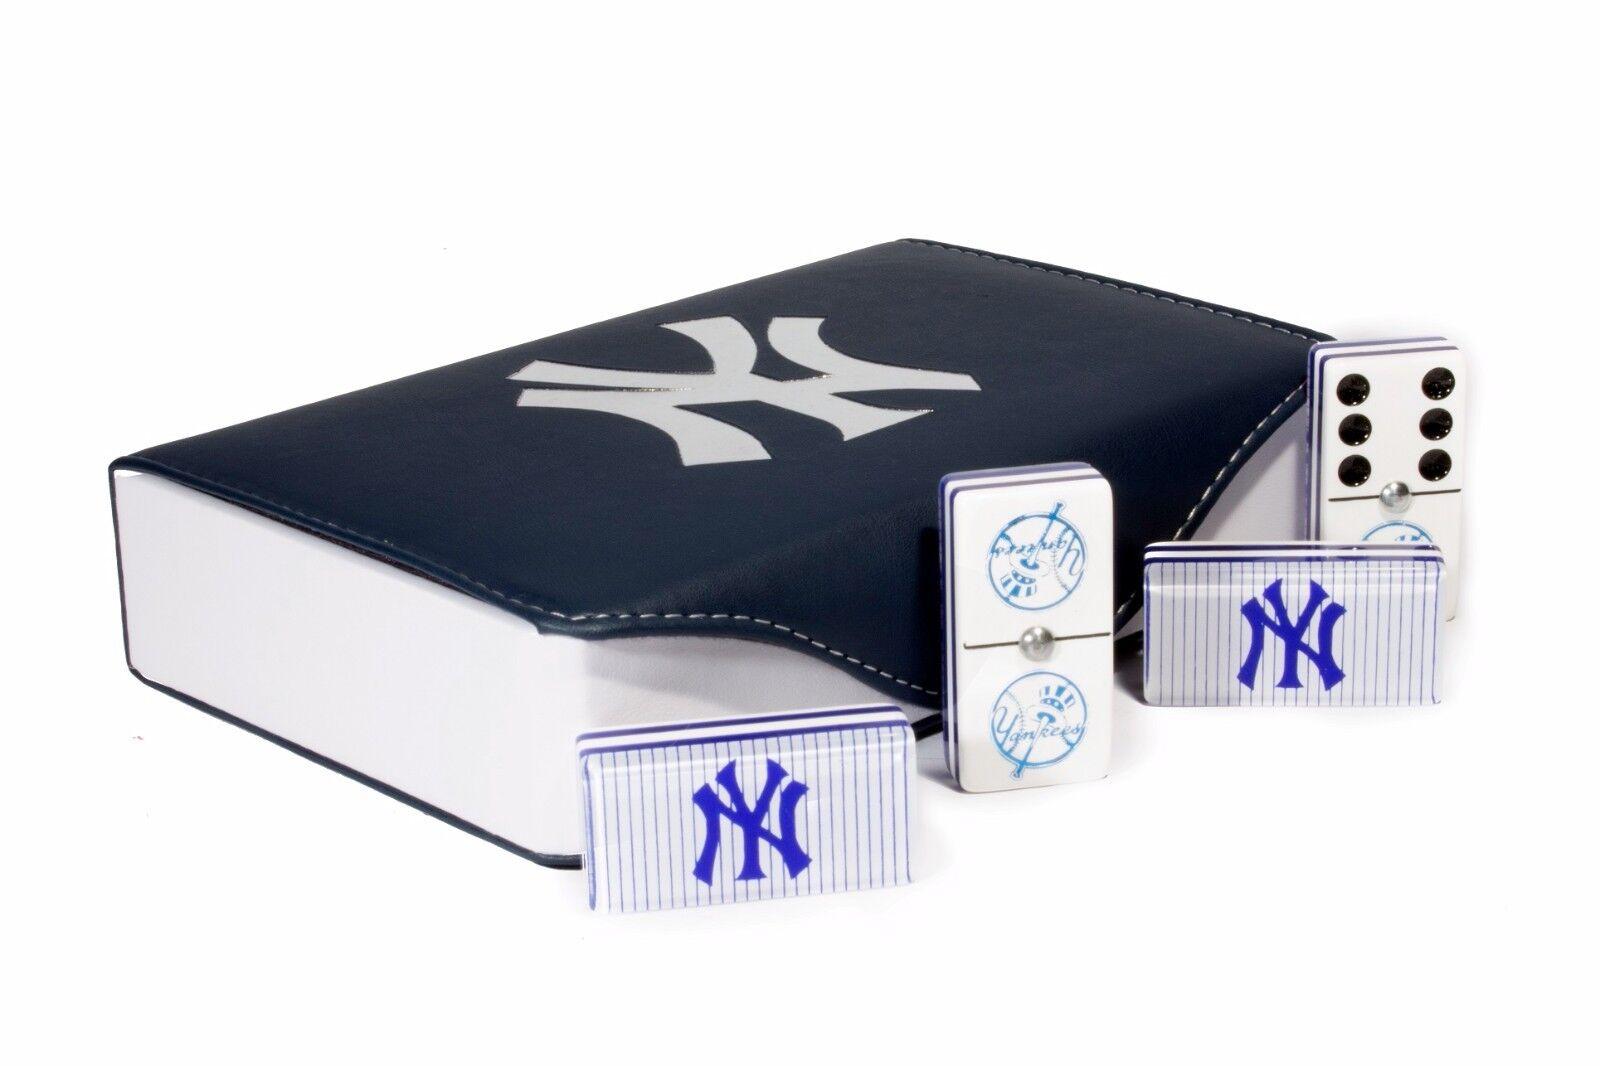 nuovo  York Yankees Jumbo Domino doppio Six, 5 Coats 100% Acrylic. Engraved Case  alla moda